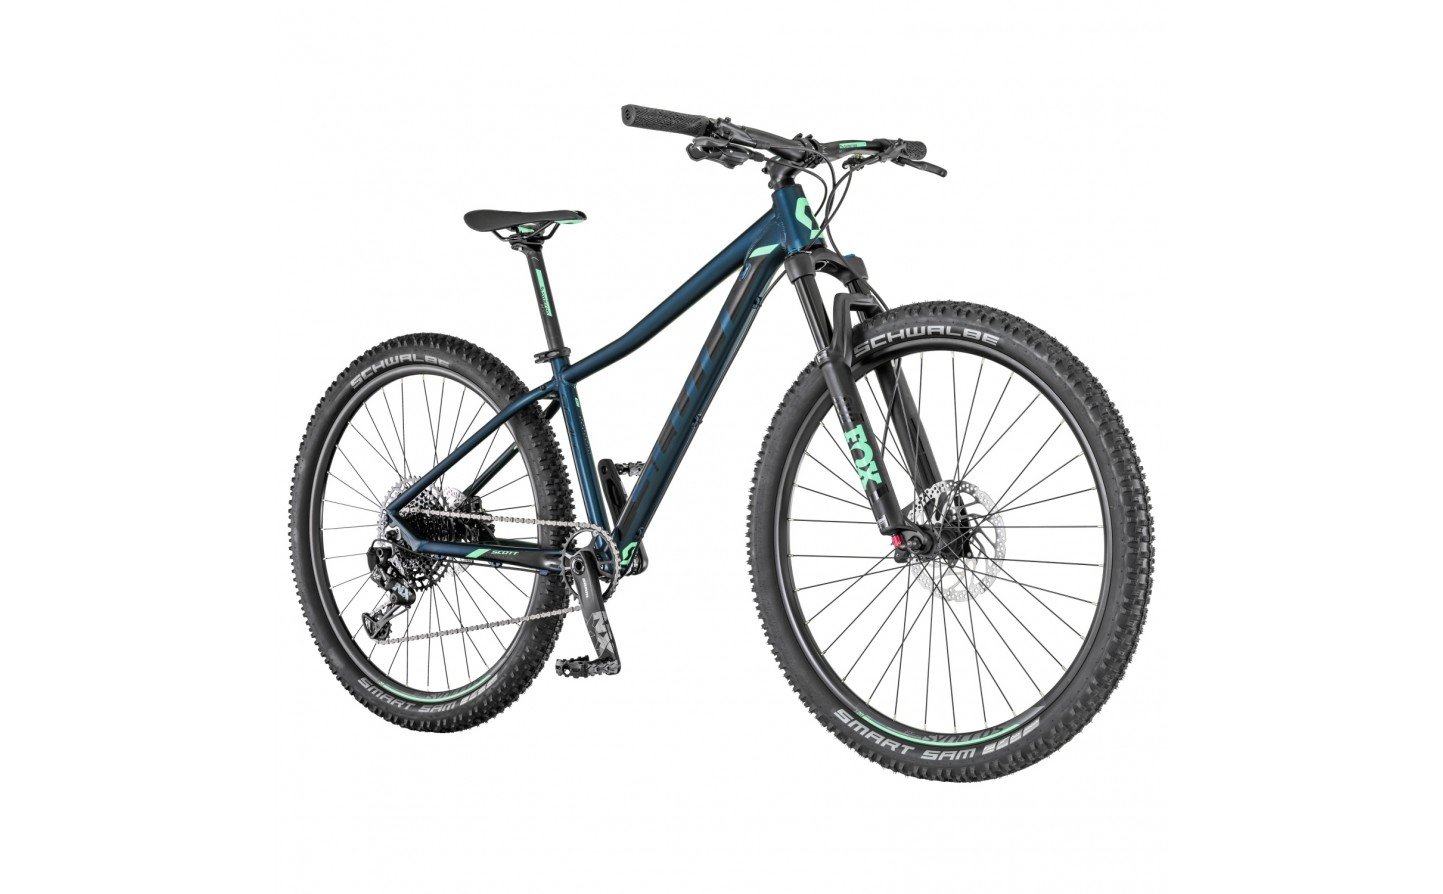 hight resolution of scott contessa scale 10 auto electrical wiring diagram bicicleta scott contessa scale 10 27 5 u0026